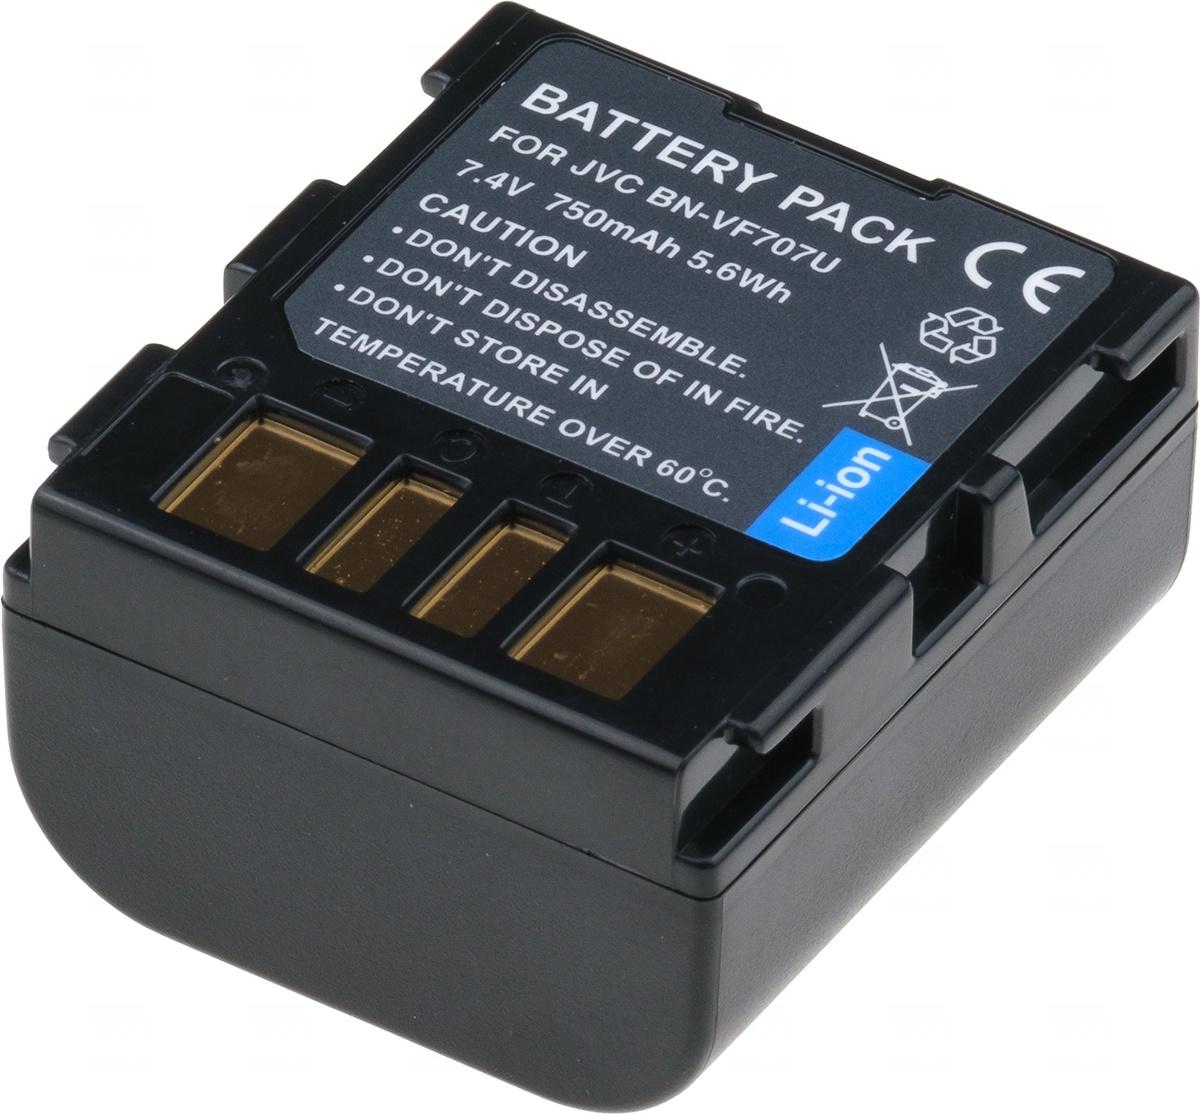 Baterie T6 Power BN-VF707U, BN-VF707, BN-VF707US, LY34647-002B